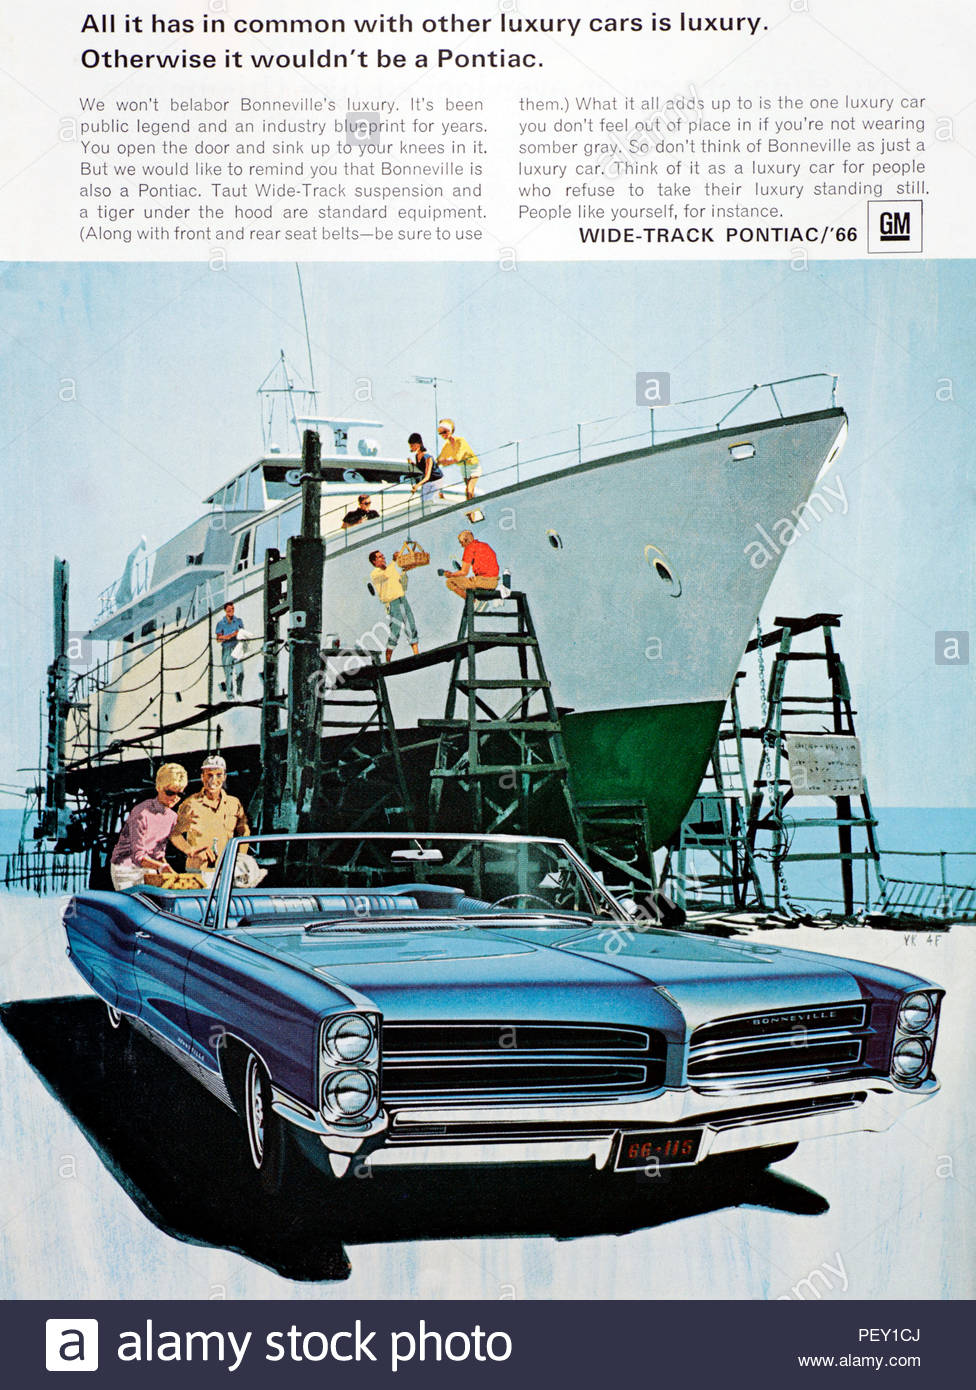 Vintage Advertising For The Pontiac Bonneville Convertible Car 1966